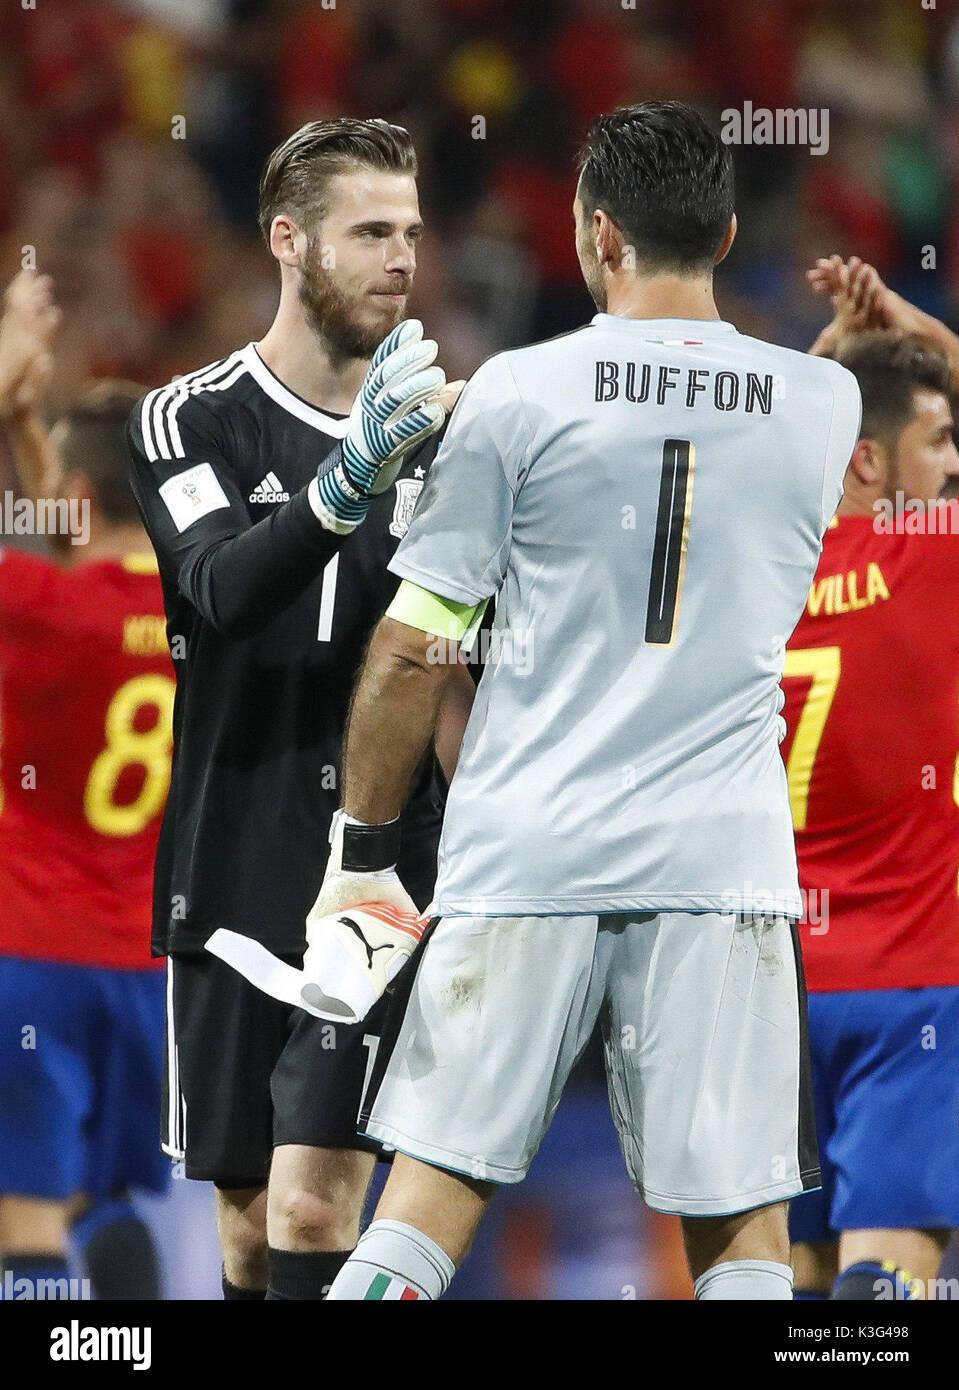 866e57da4 Spanish goalkeeper David de Gea (L) greets Italian goalkeeper Gianluigi  Buffon (R) after the qualifying match for the 2018 World Cup in Russia